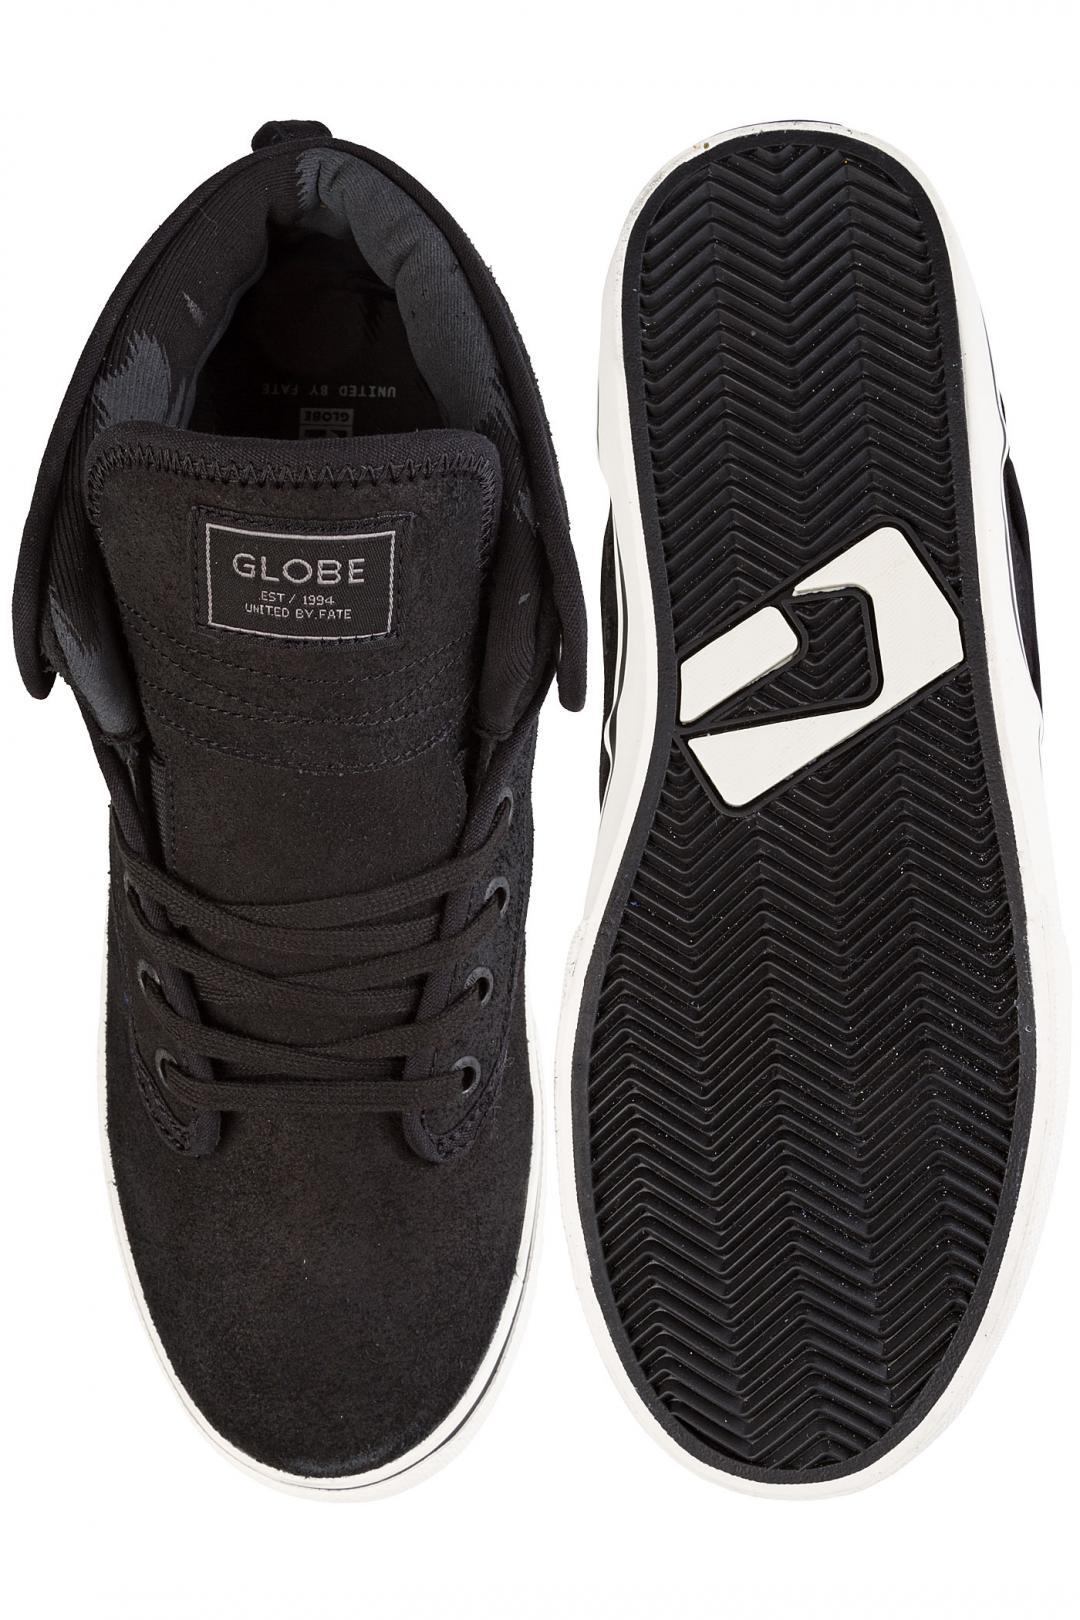 Uomo Globe Motley Mid black antique   Sneakers mid top